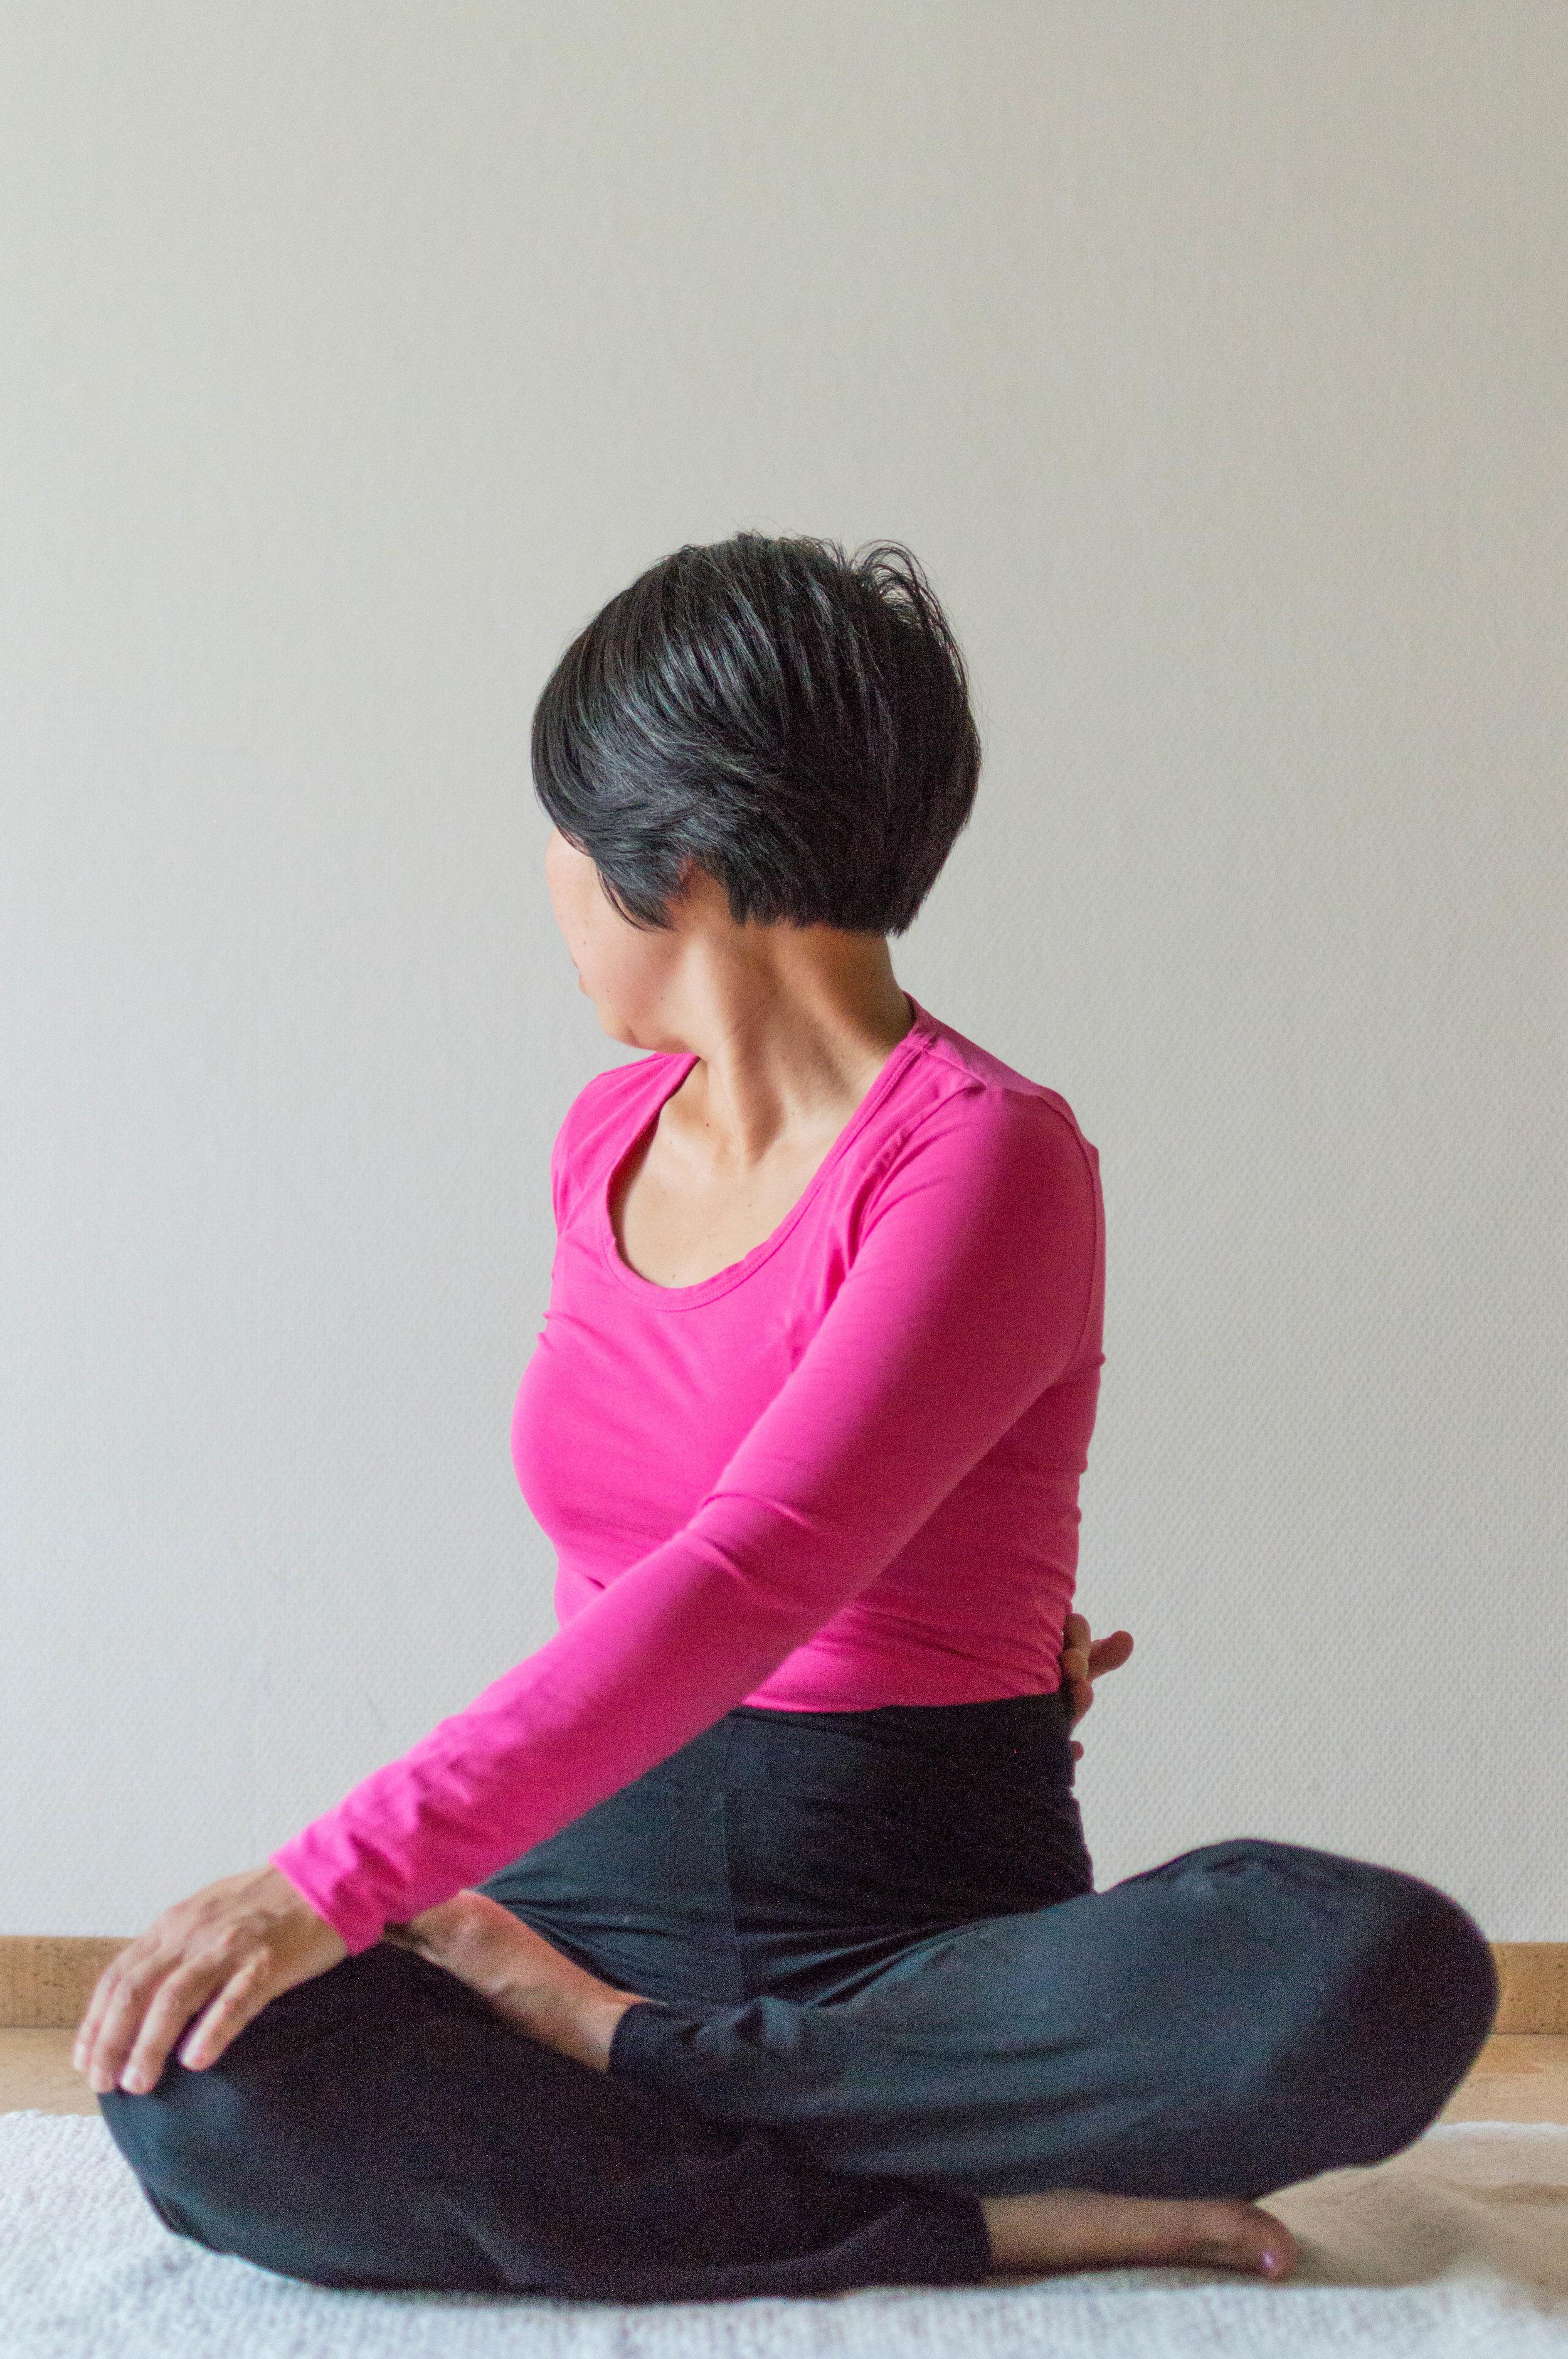 #yogawithpete